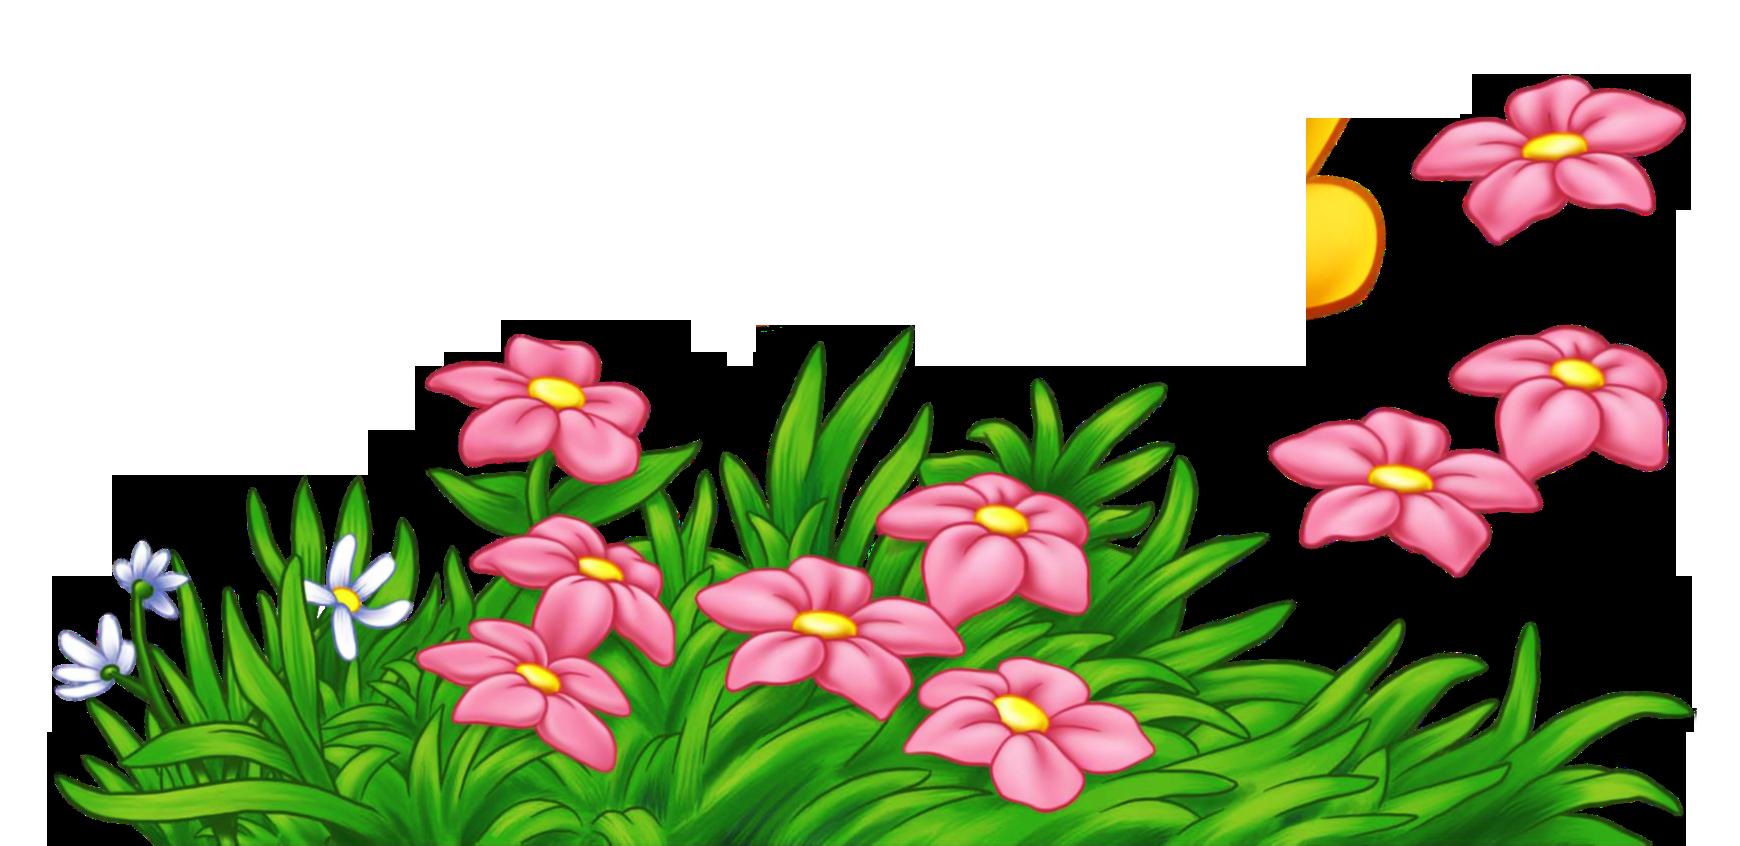 Summer Flowers Png - ClipArt Best